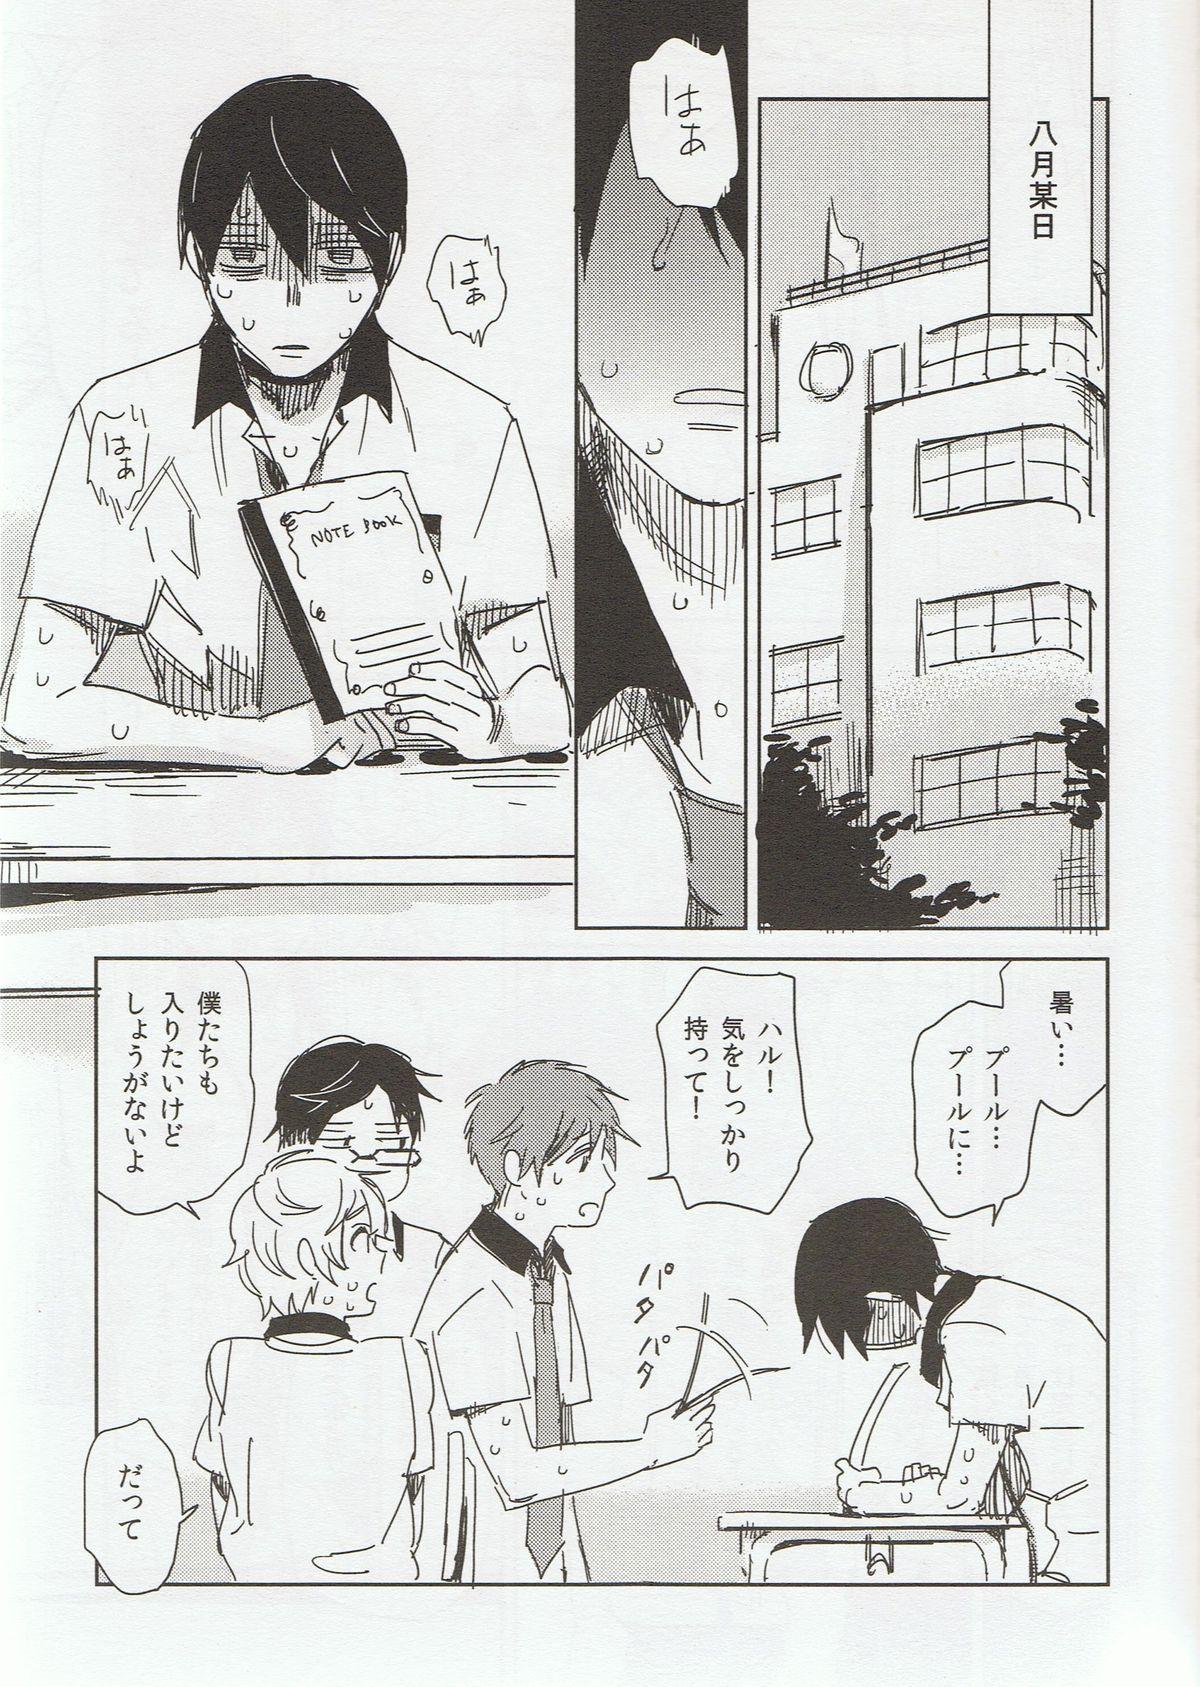 Sou da, Tottori Sakyuu Ikou. 5